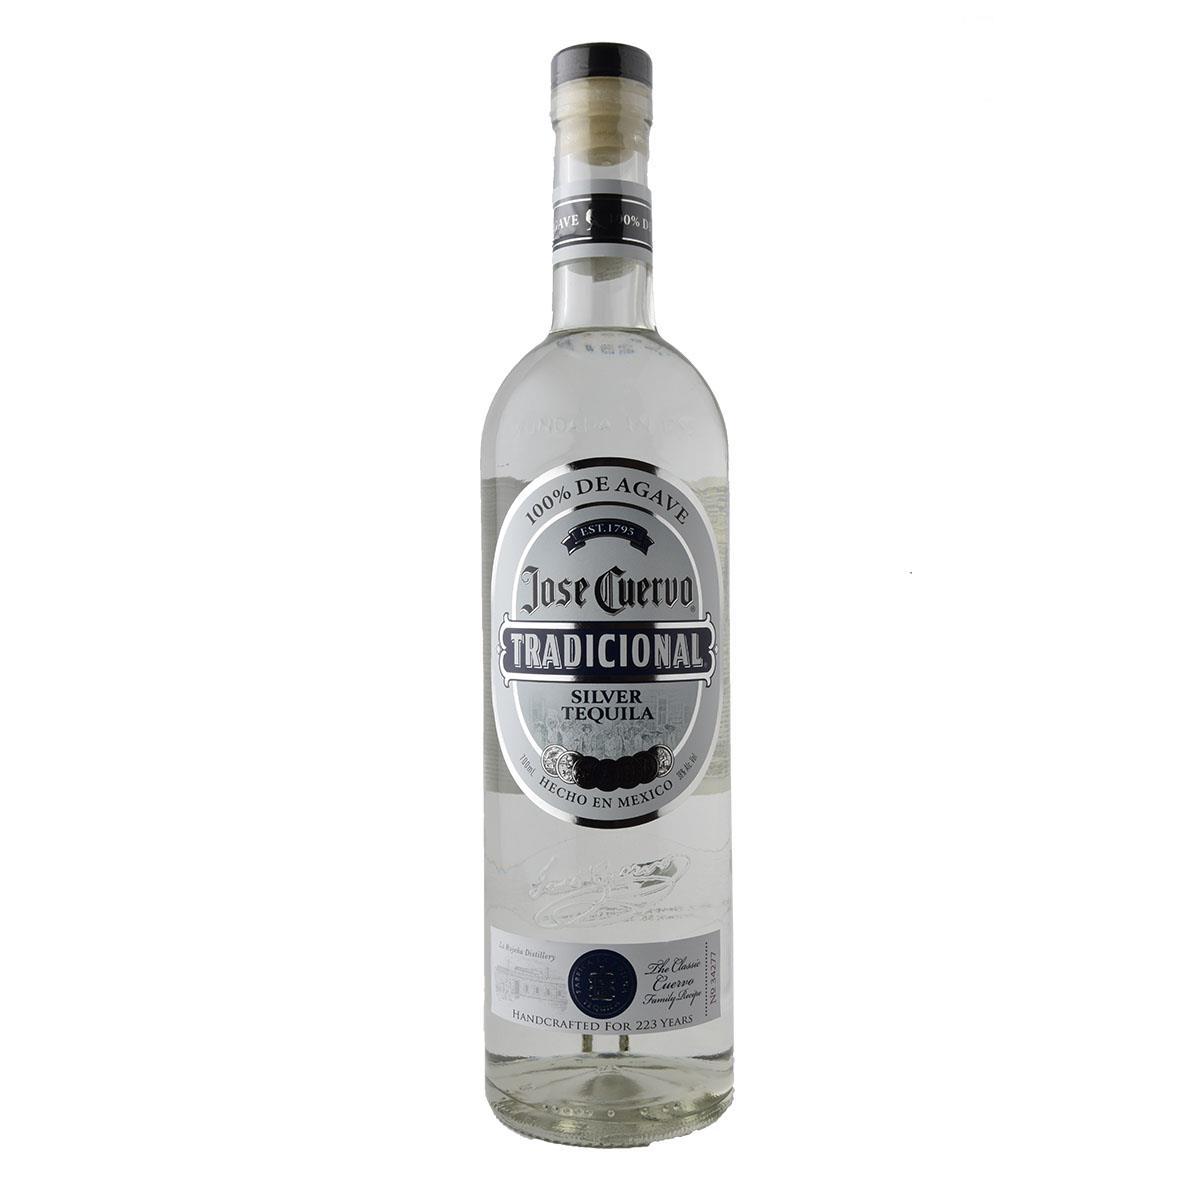 Jose Cuervo Tradicional Silver Tequila 700ml